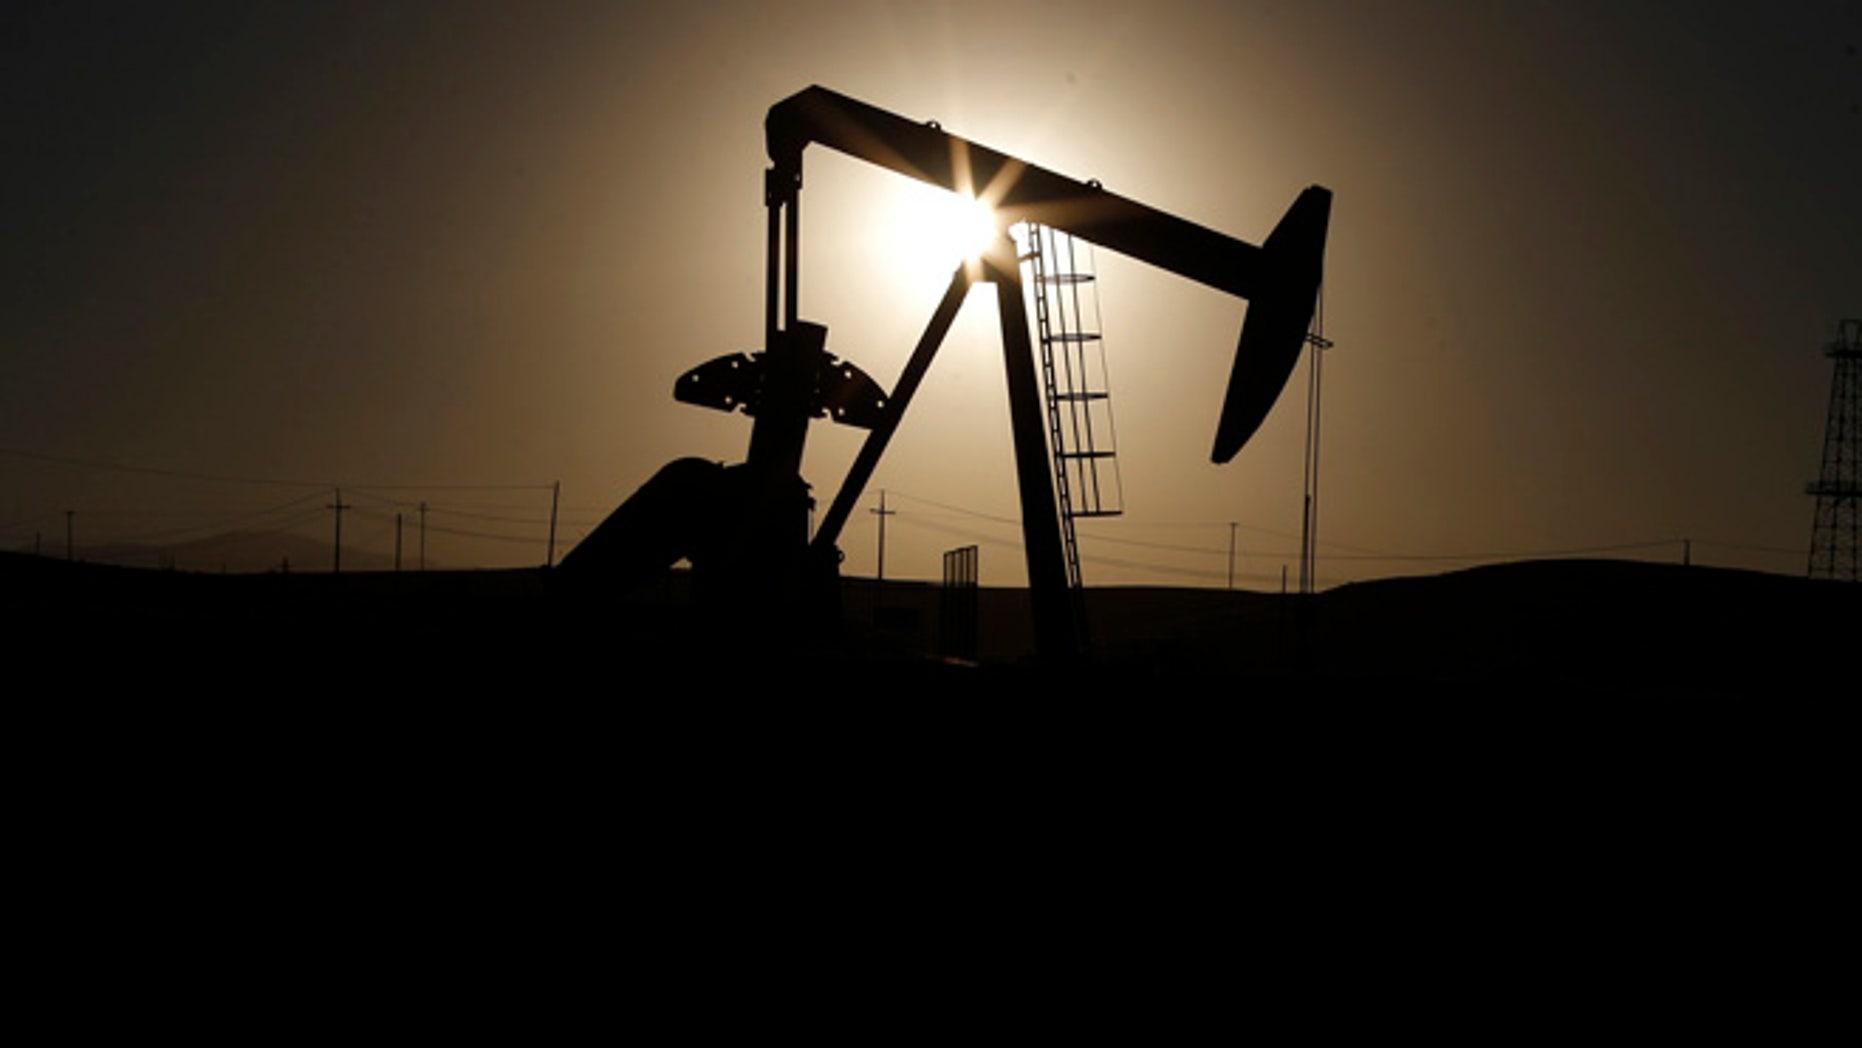 Oct. 14, 2014: A pump jack is seen at sunrise near Bakersfield, California. (Reuters)